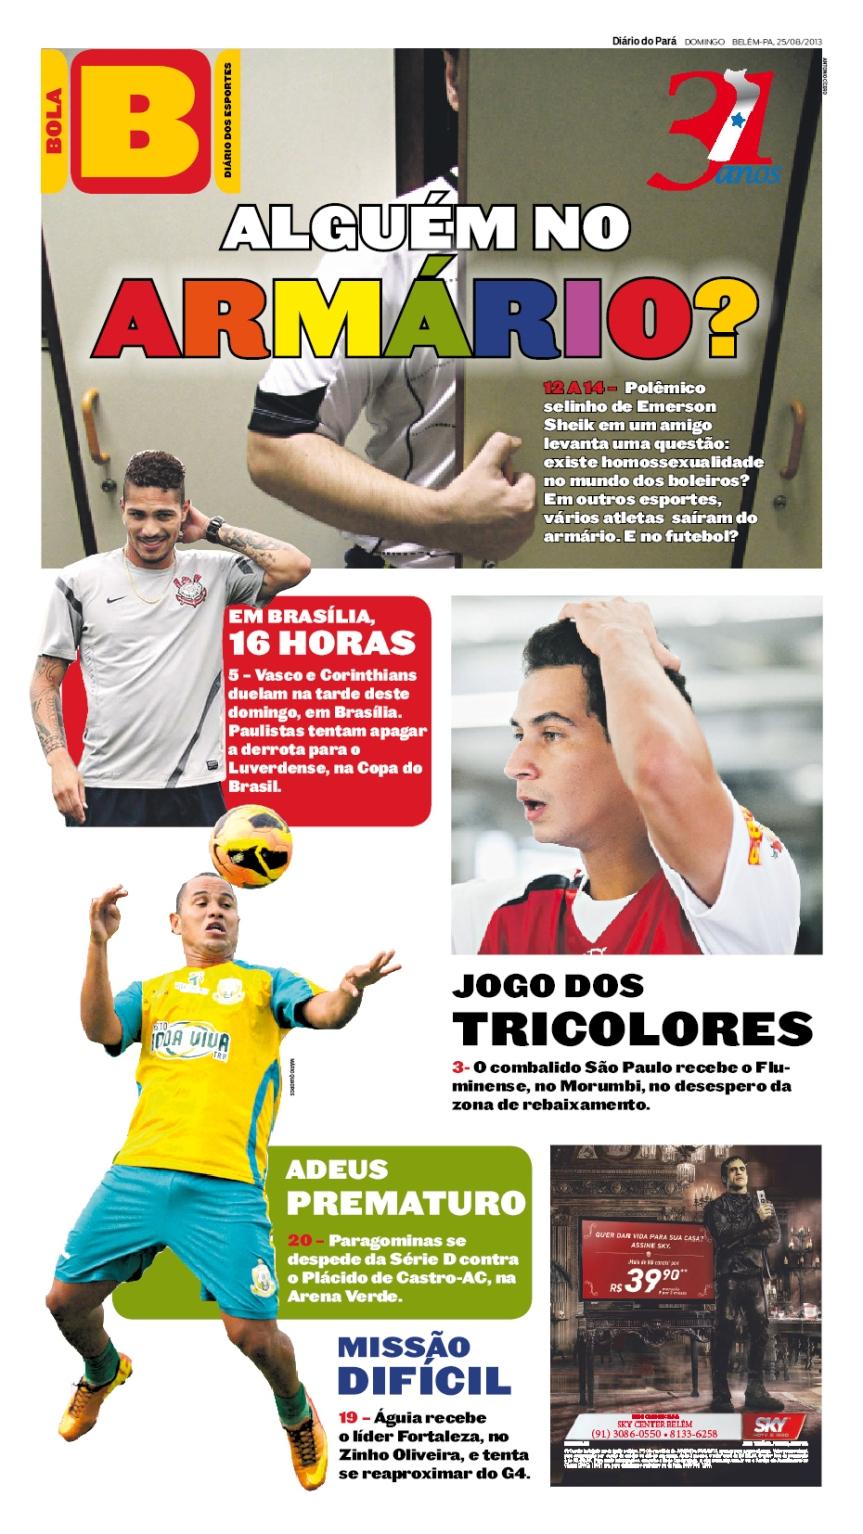 capa do bola 25-08-2013o